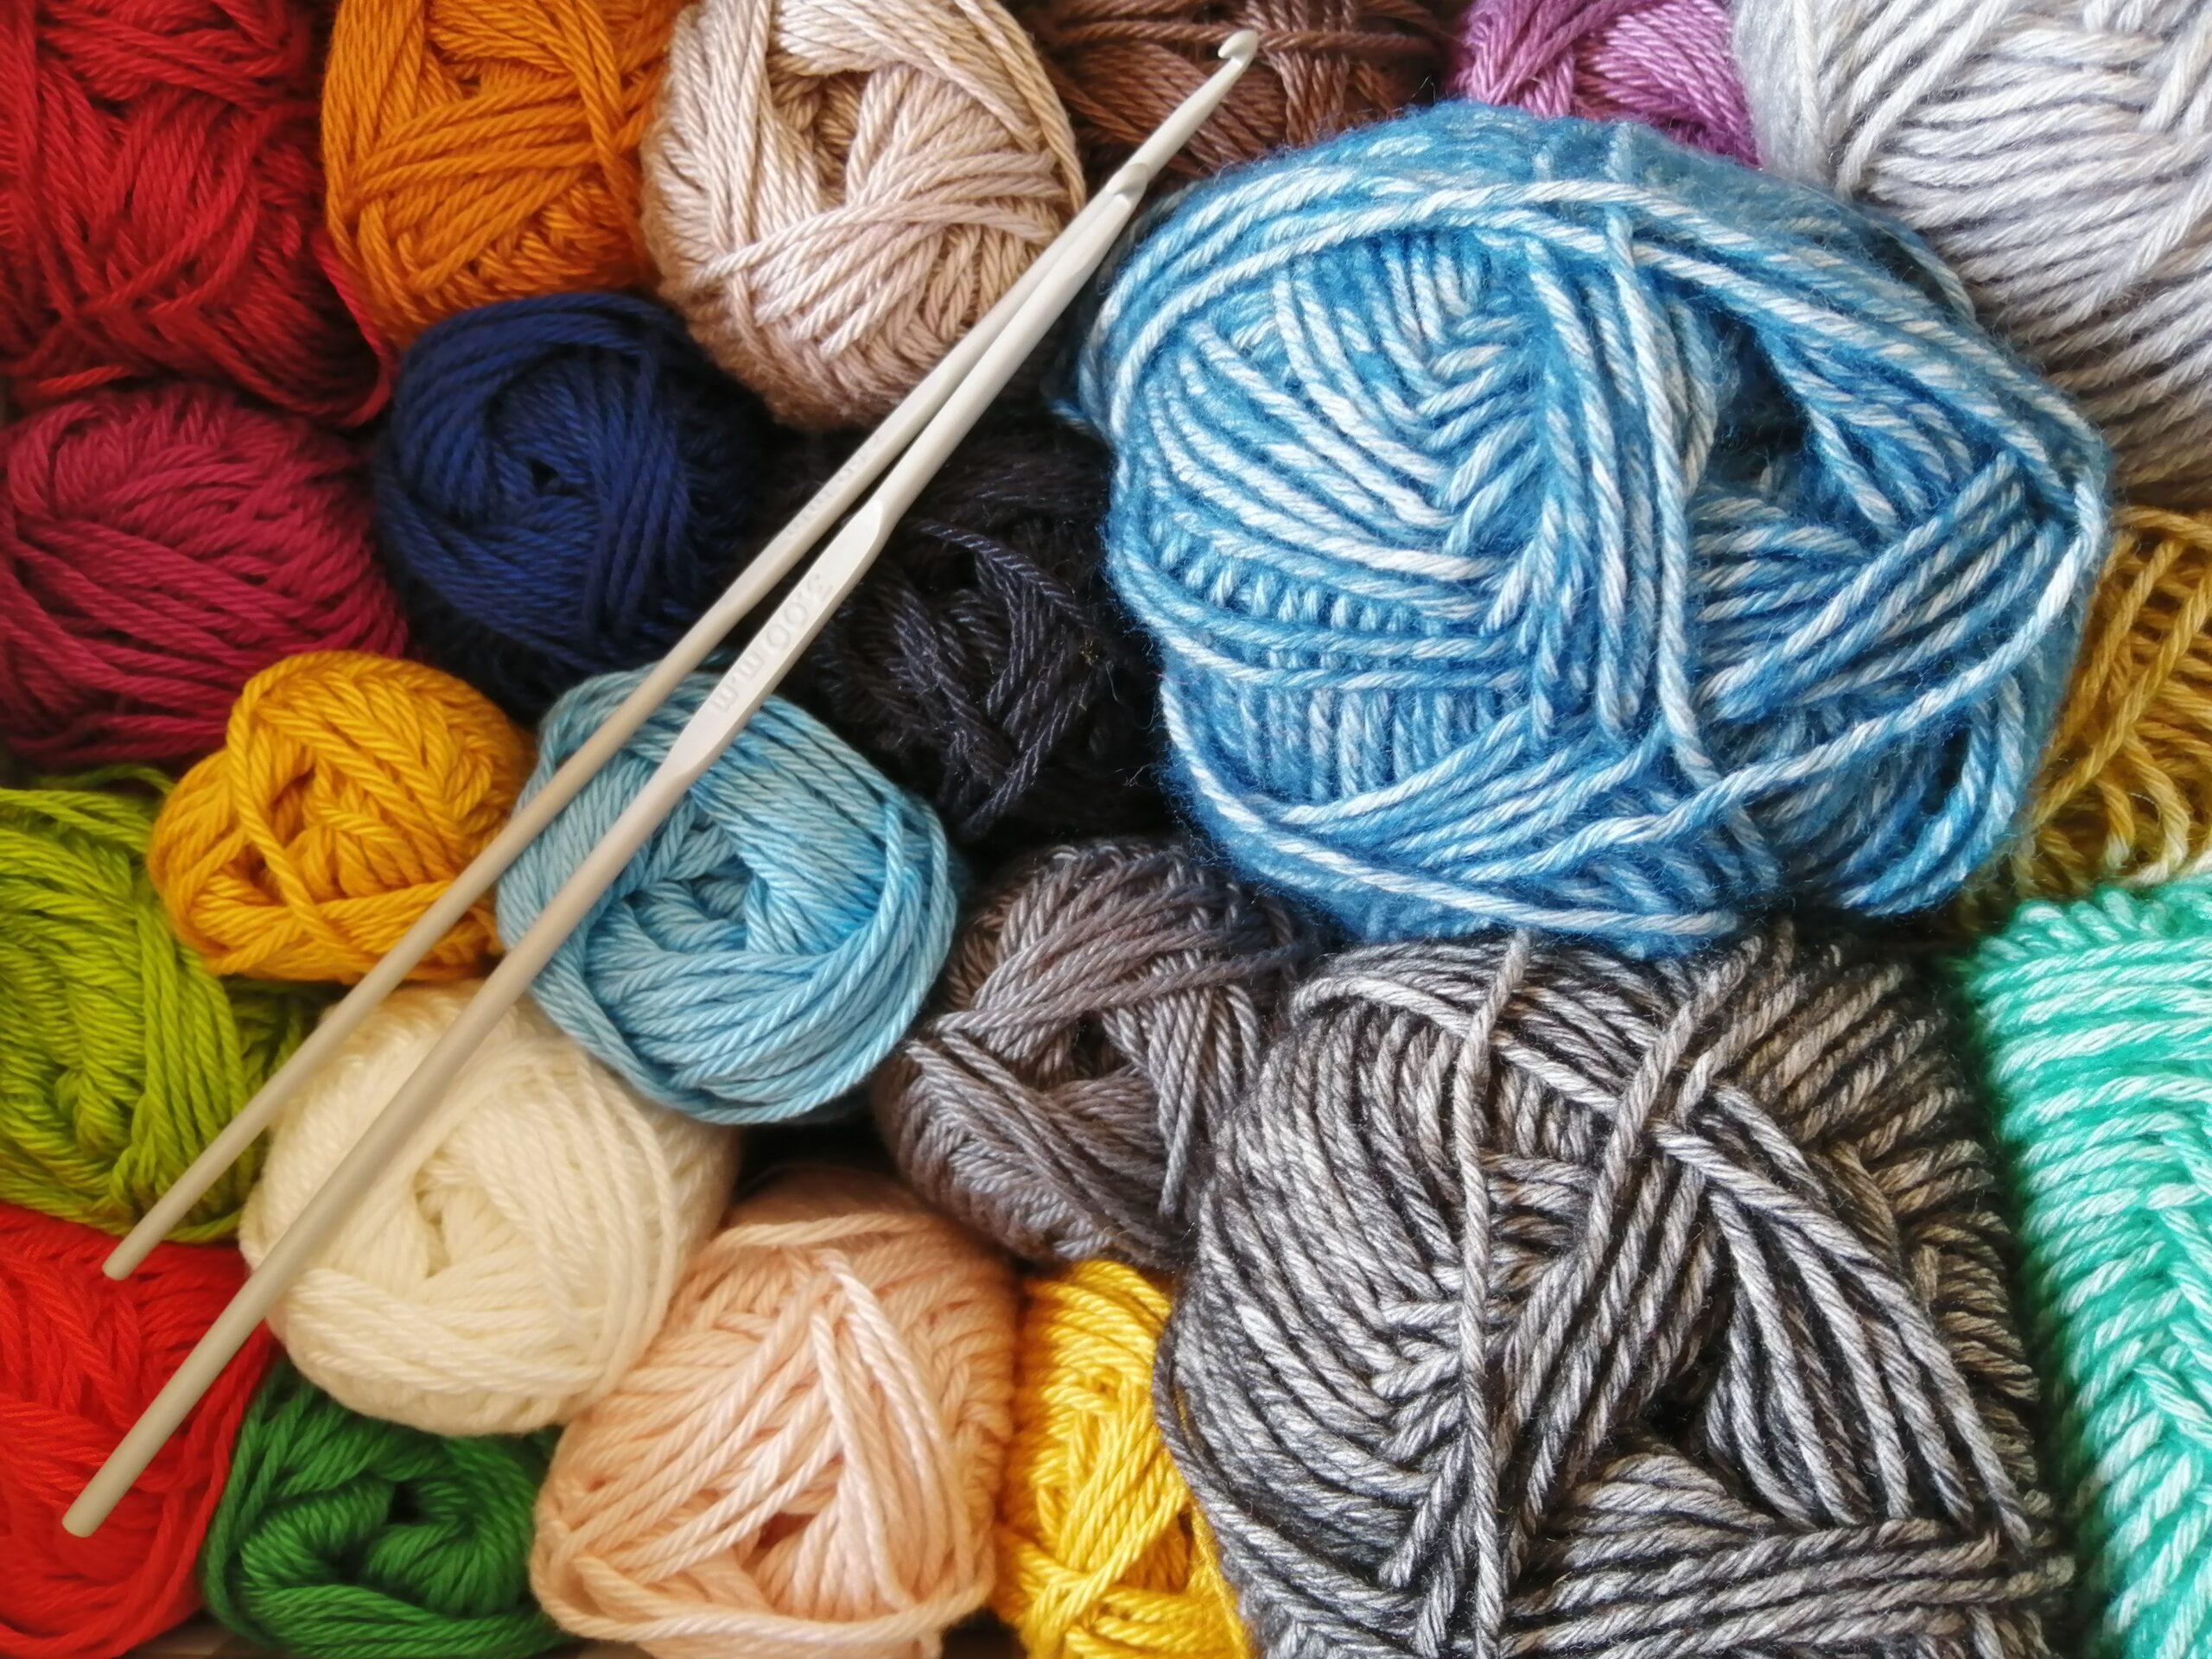 uso lana jabones artesanales